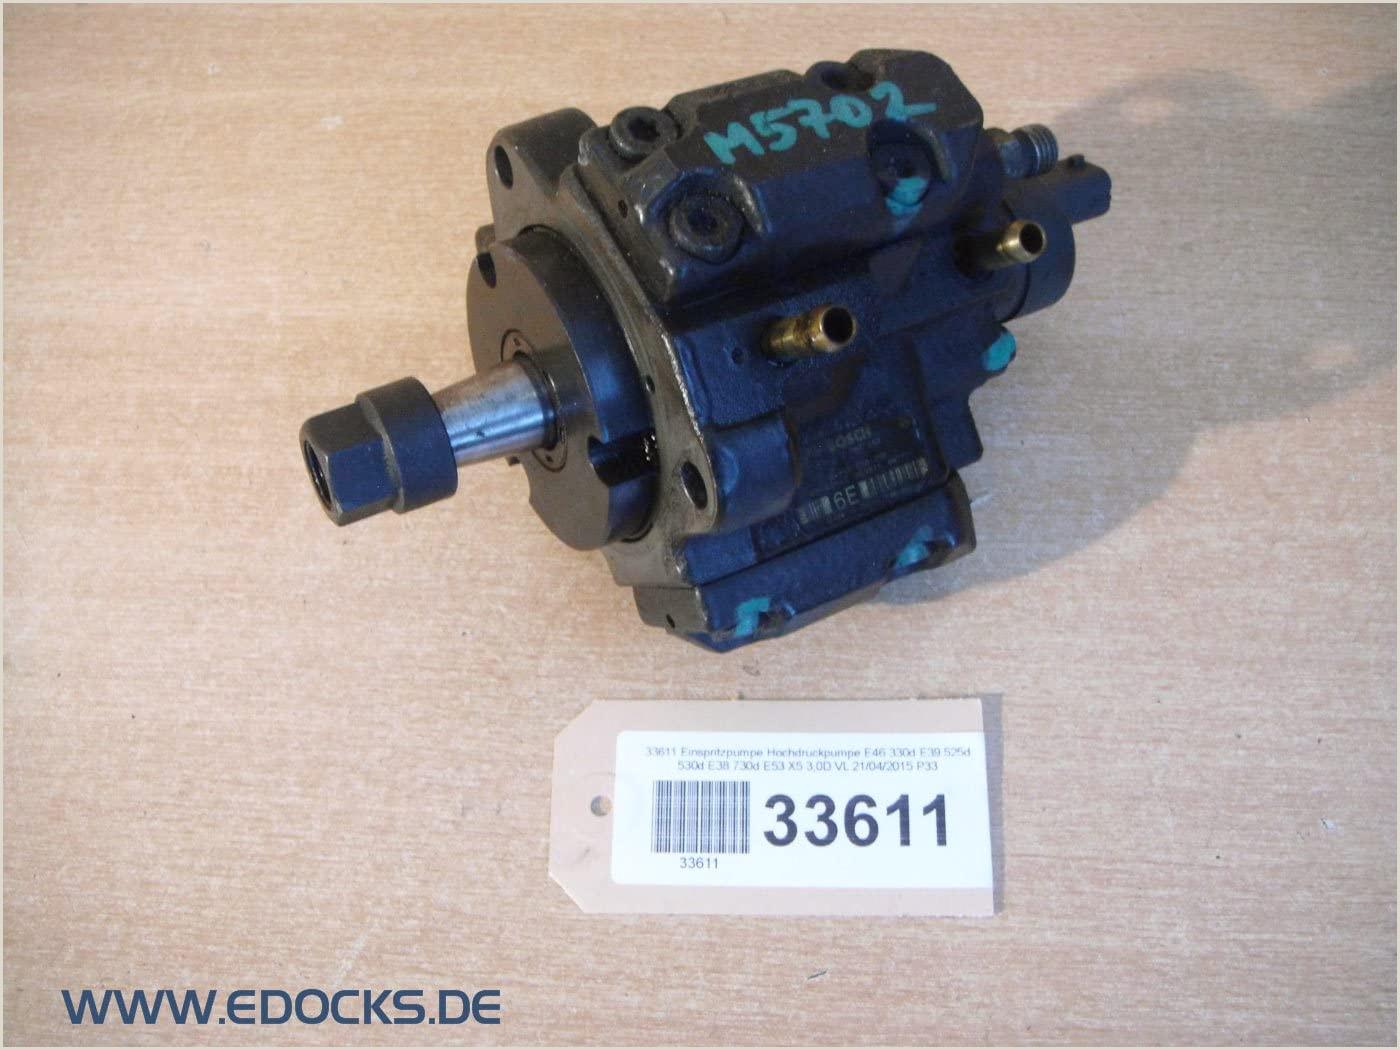 Best Business Cards For Fuel And Parts Fuel Injection Pump Average 330d E39 E46 E38 E53 X5 525d